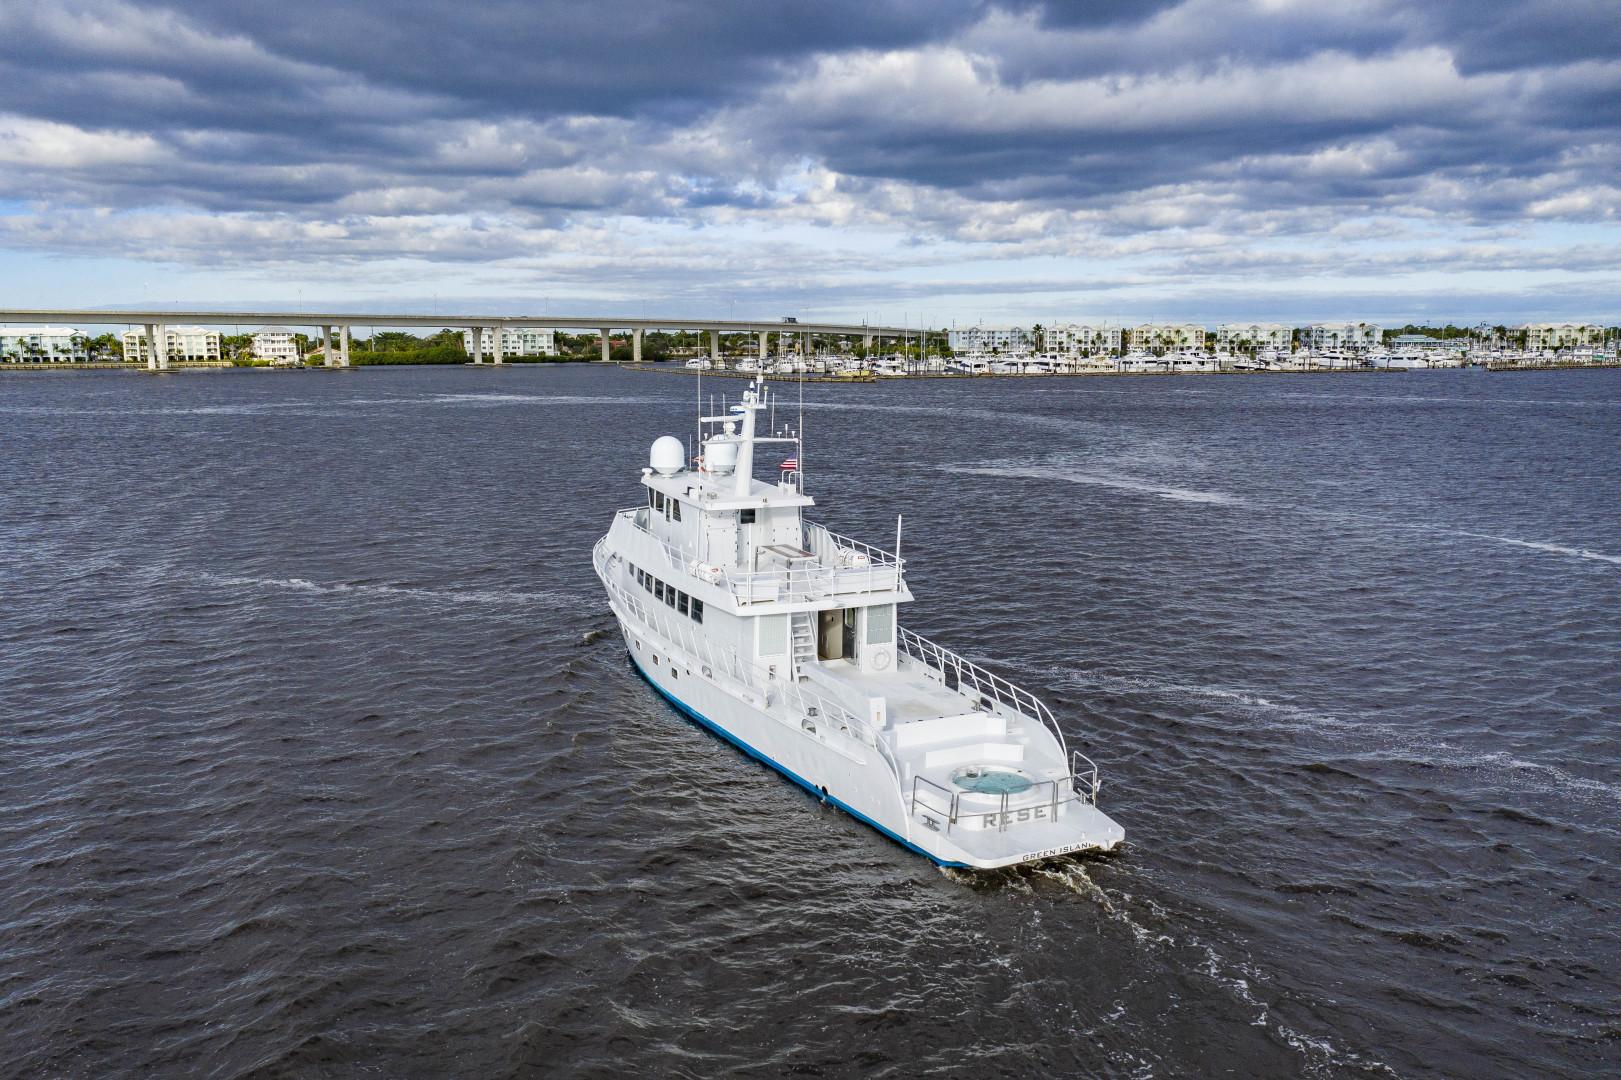 GlassTech-Expedition Yacht 2018-Reset Stuart-Florida-United States-Profile-1568529 | Thumbnail